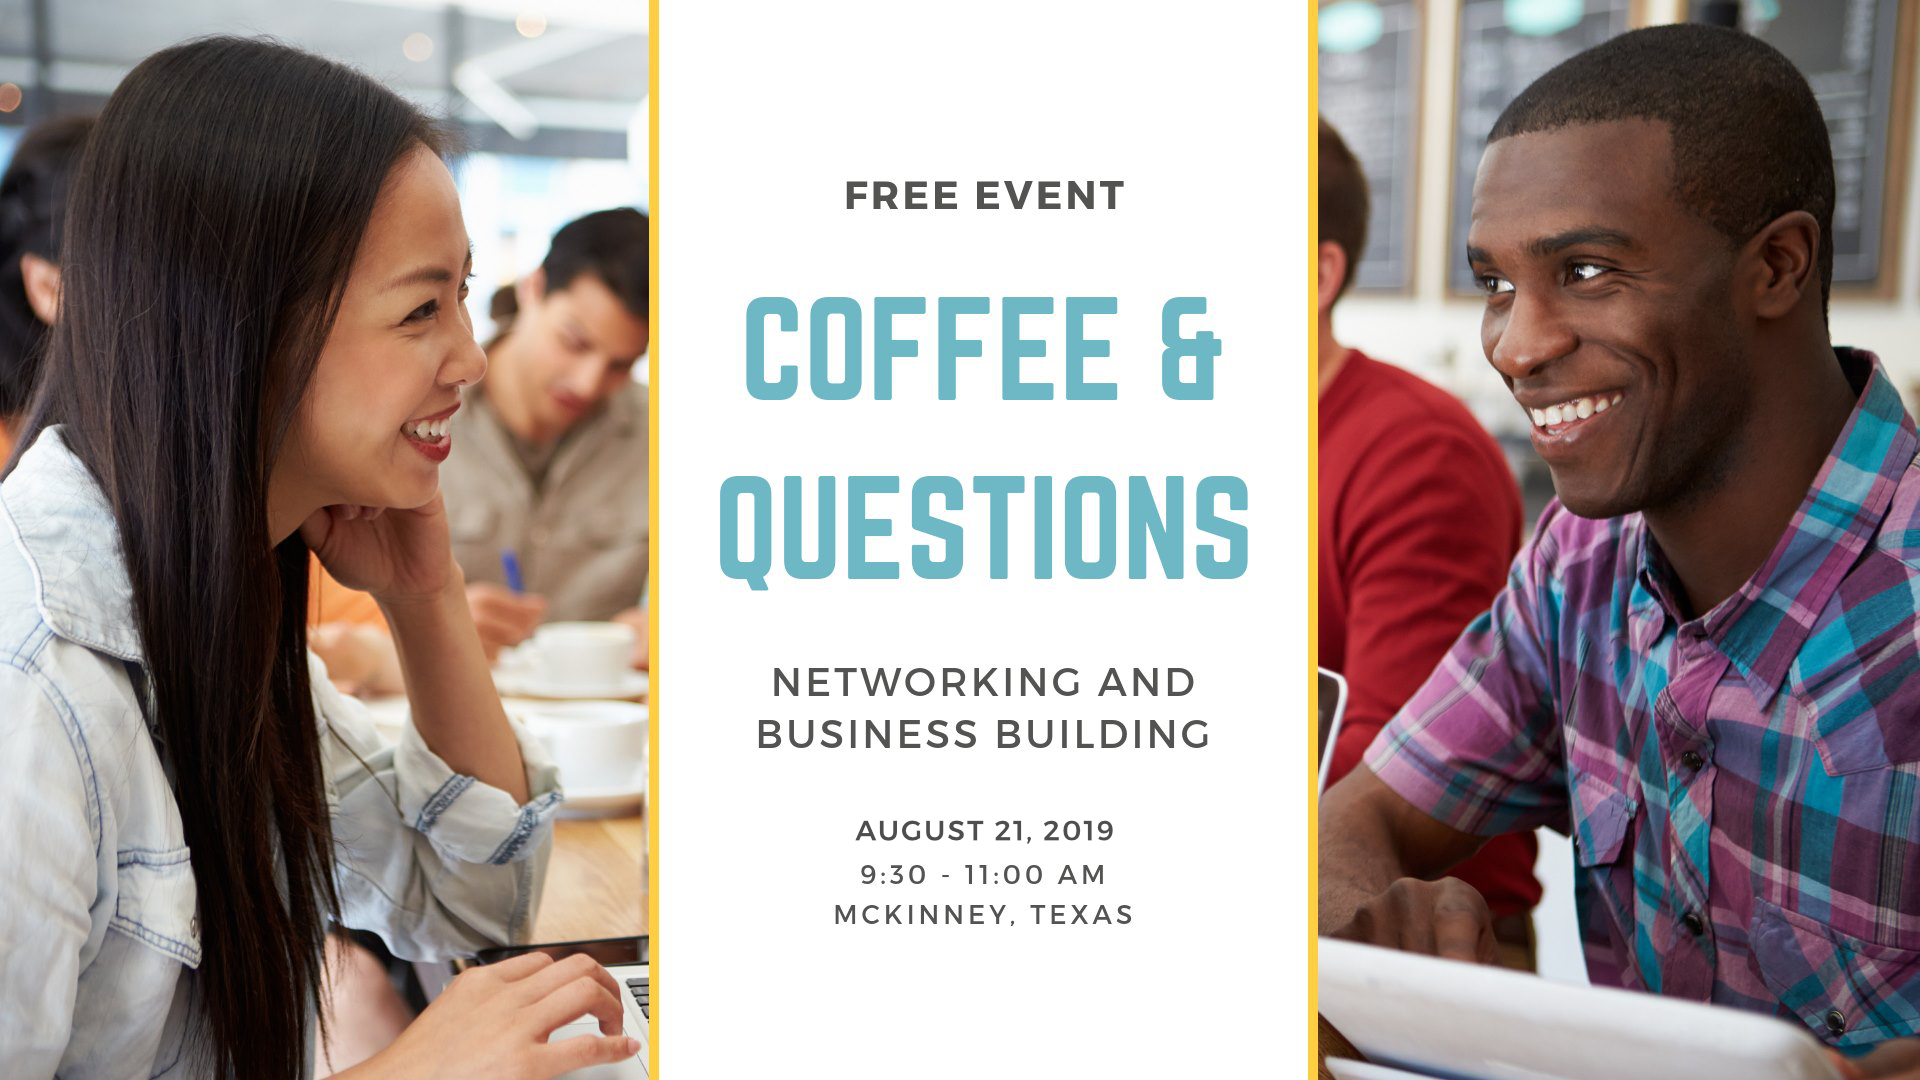 Coffee & Questions July 17 OTB Angie Brumley McKinney TX